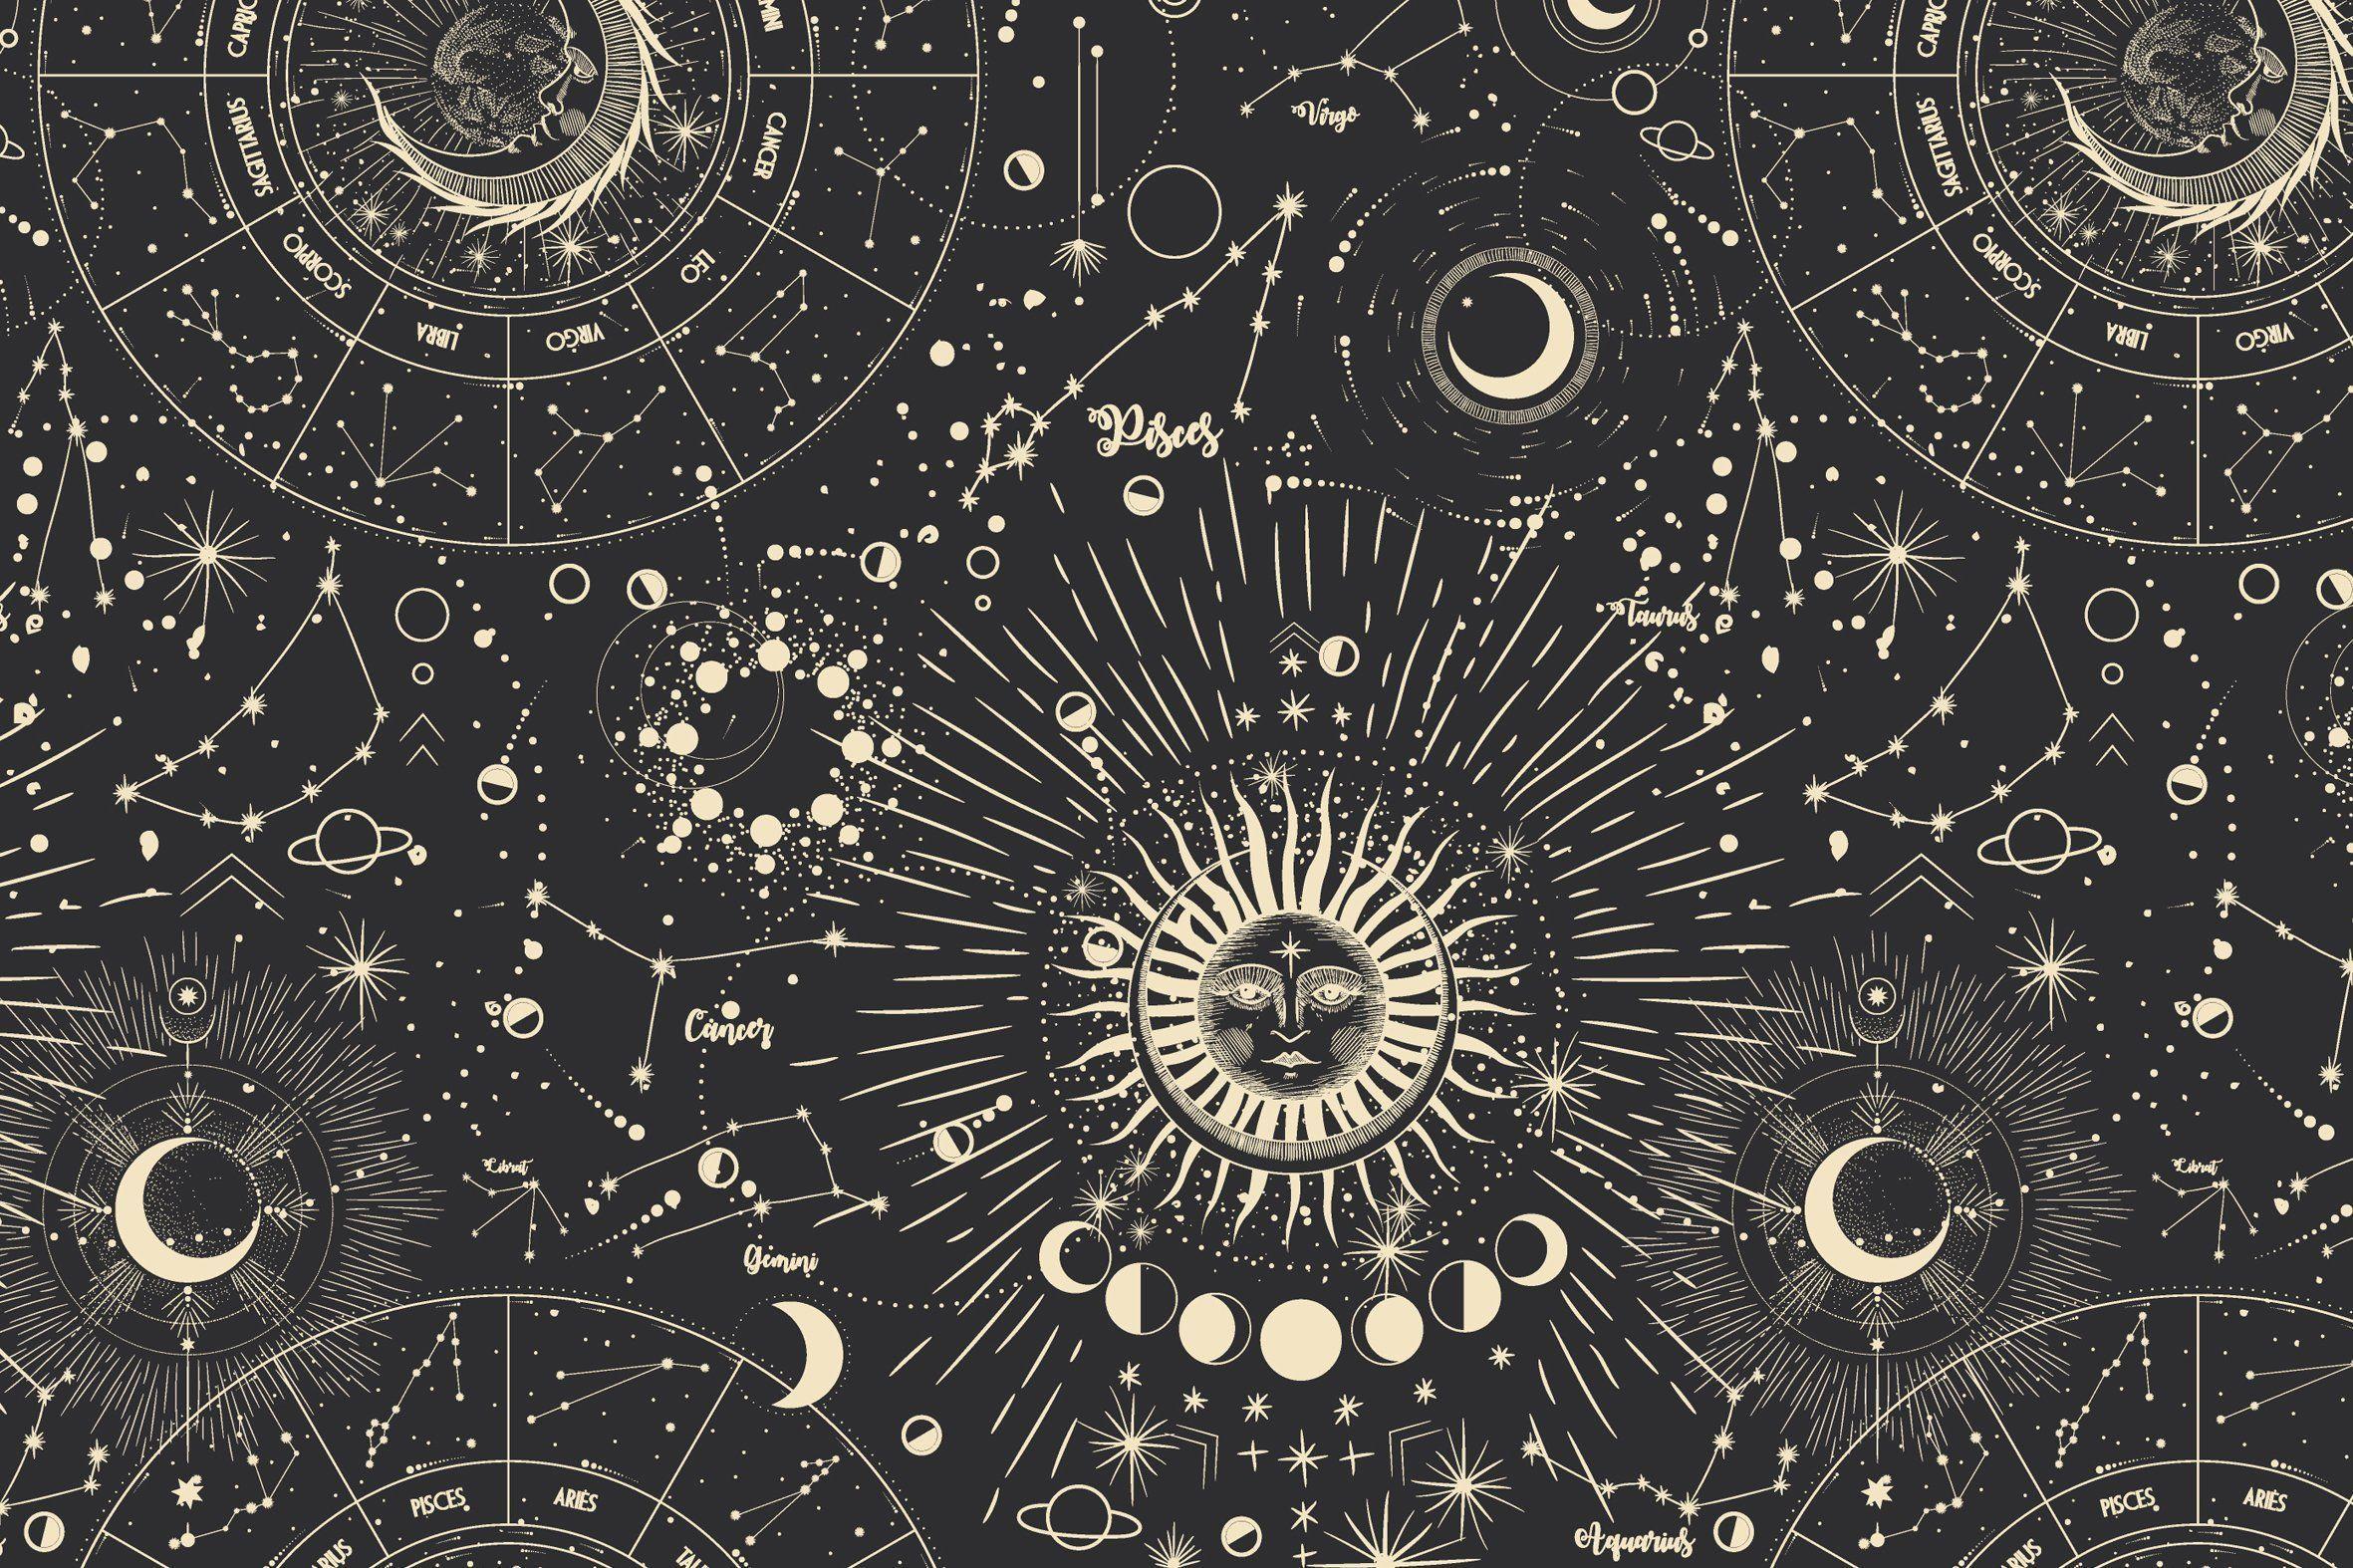 21+] Witchy Wallpaper on WallpaperSafari